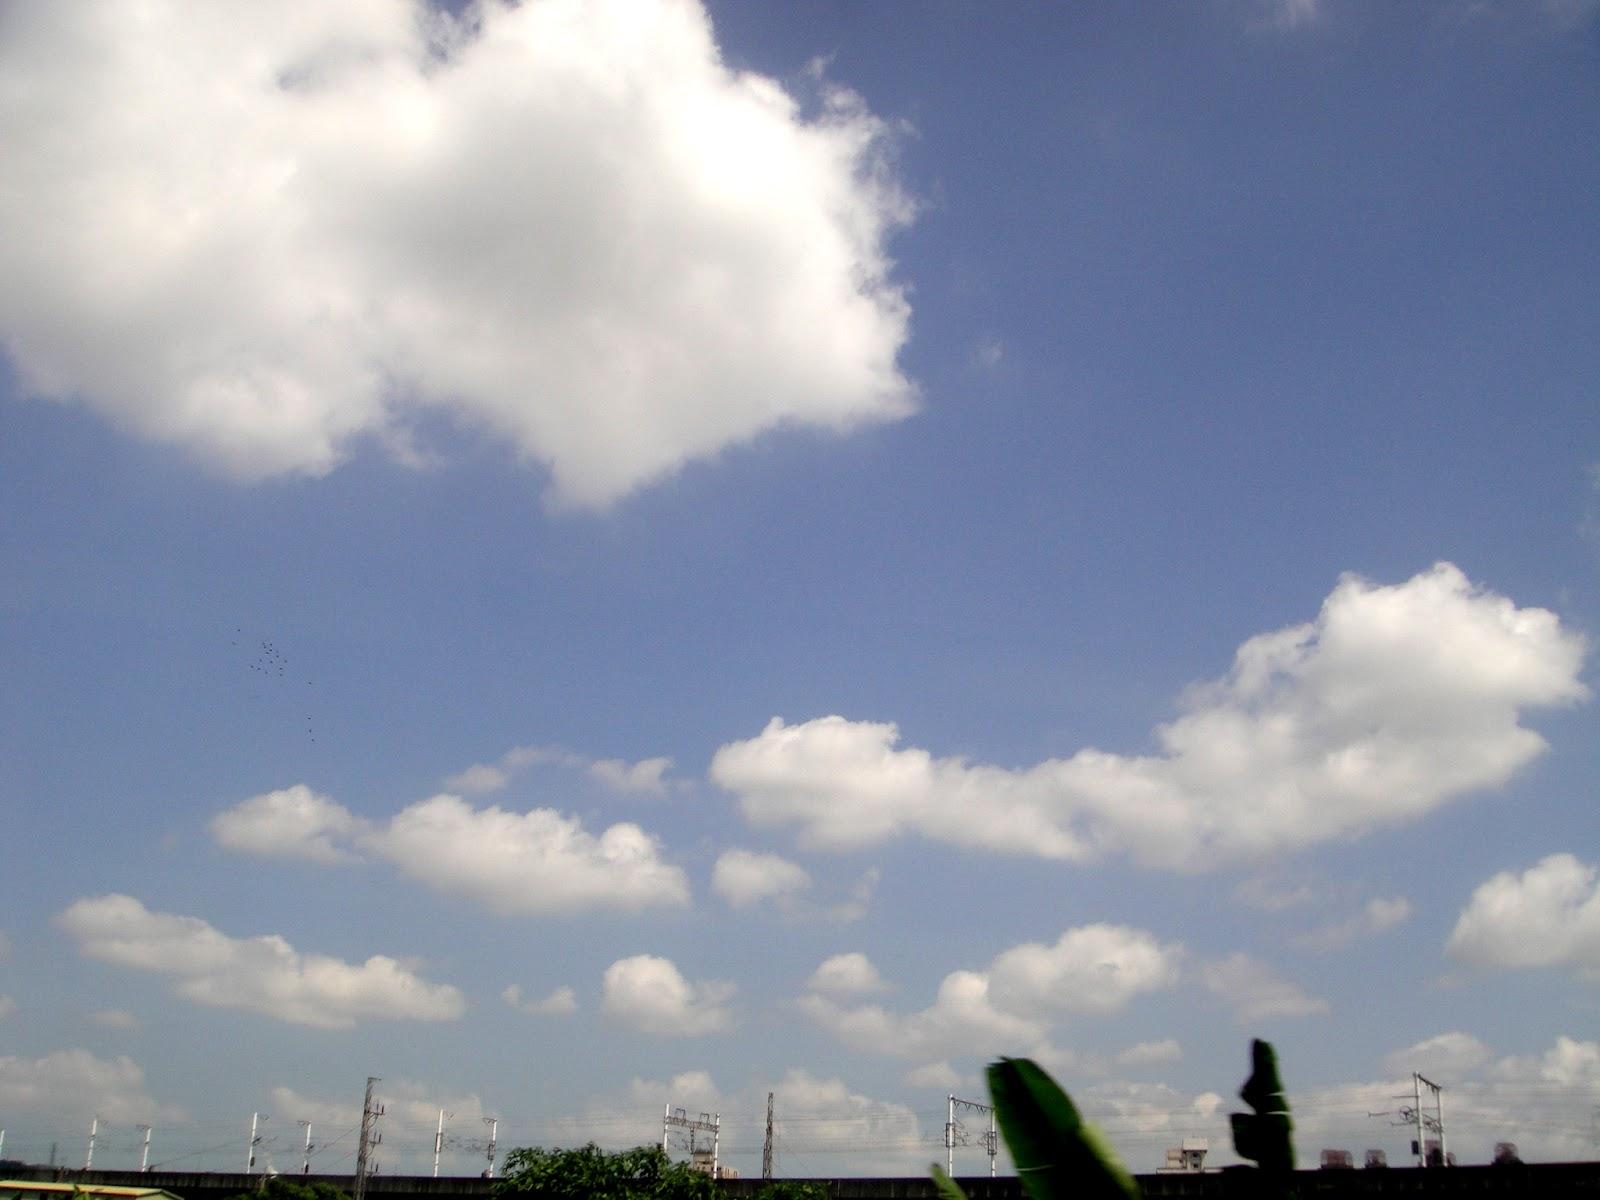 DWAN雲之端: 棉花似的浮雲,空中飄來飄去--今天天氣:晴,藍藍的天白白的雲